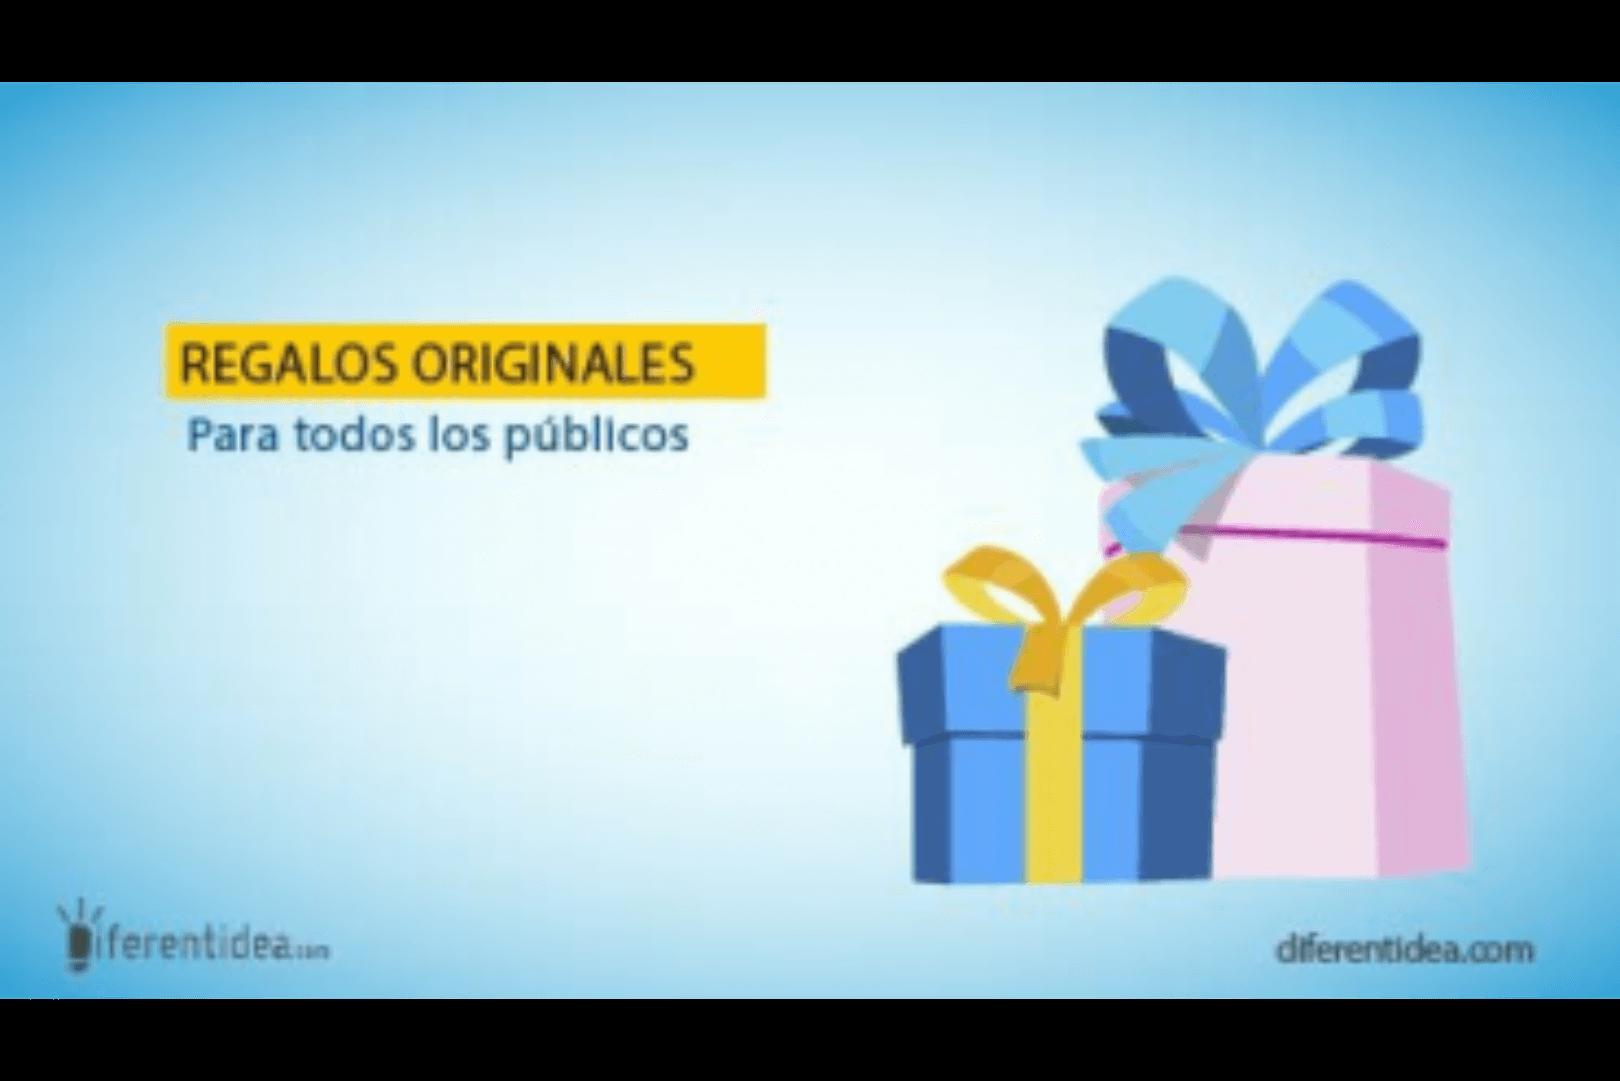 lg-b-portada diferentidea regalos originales